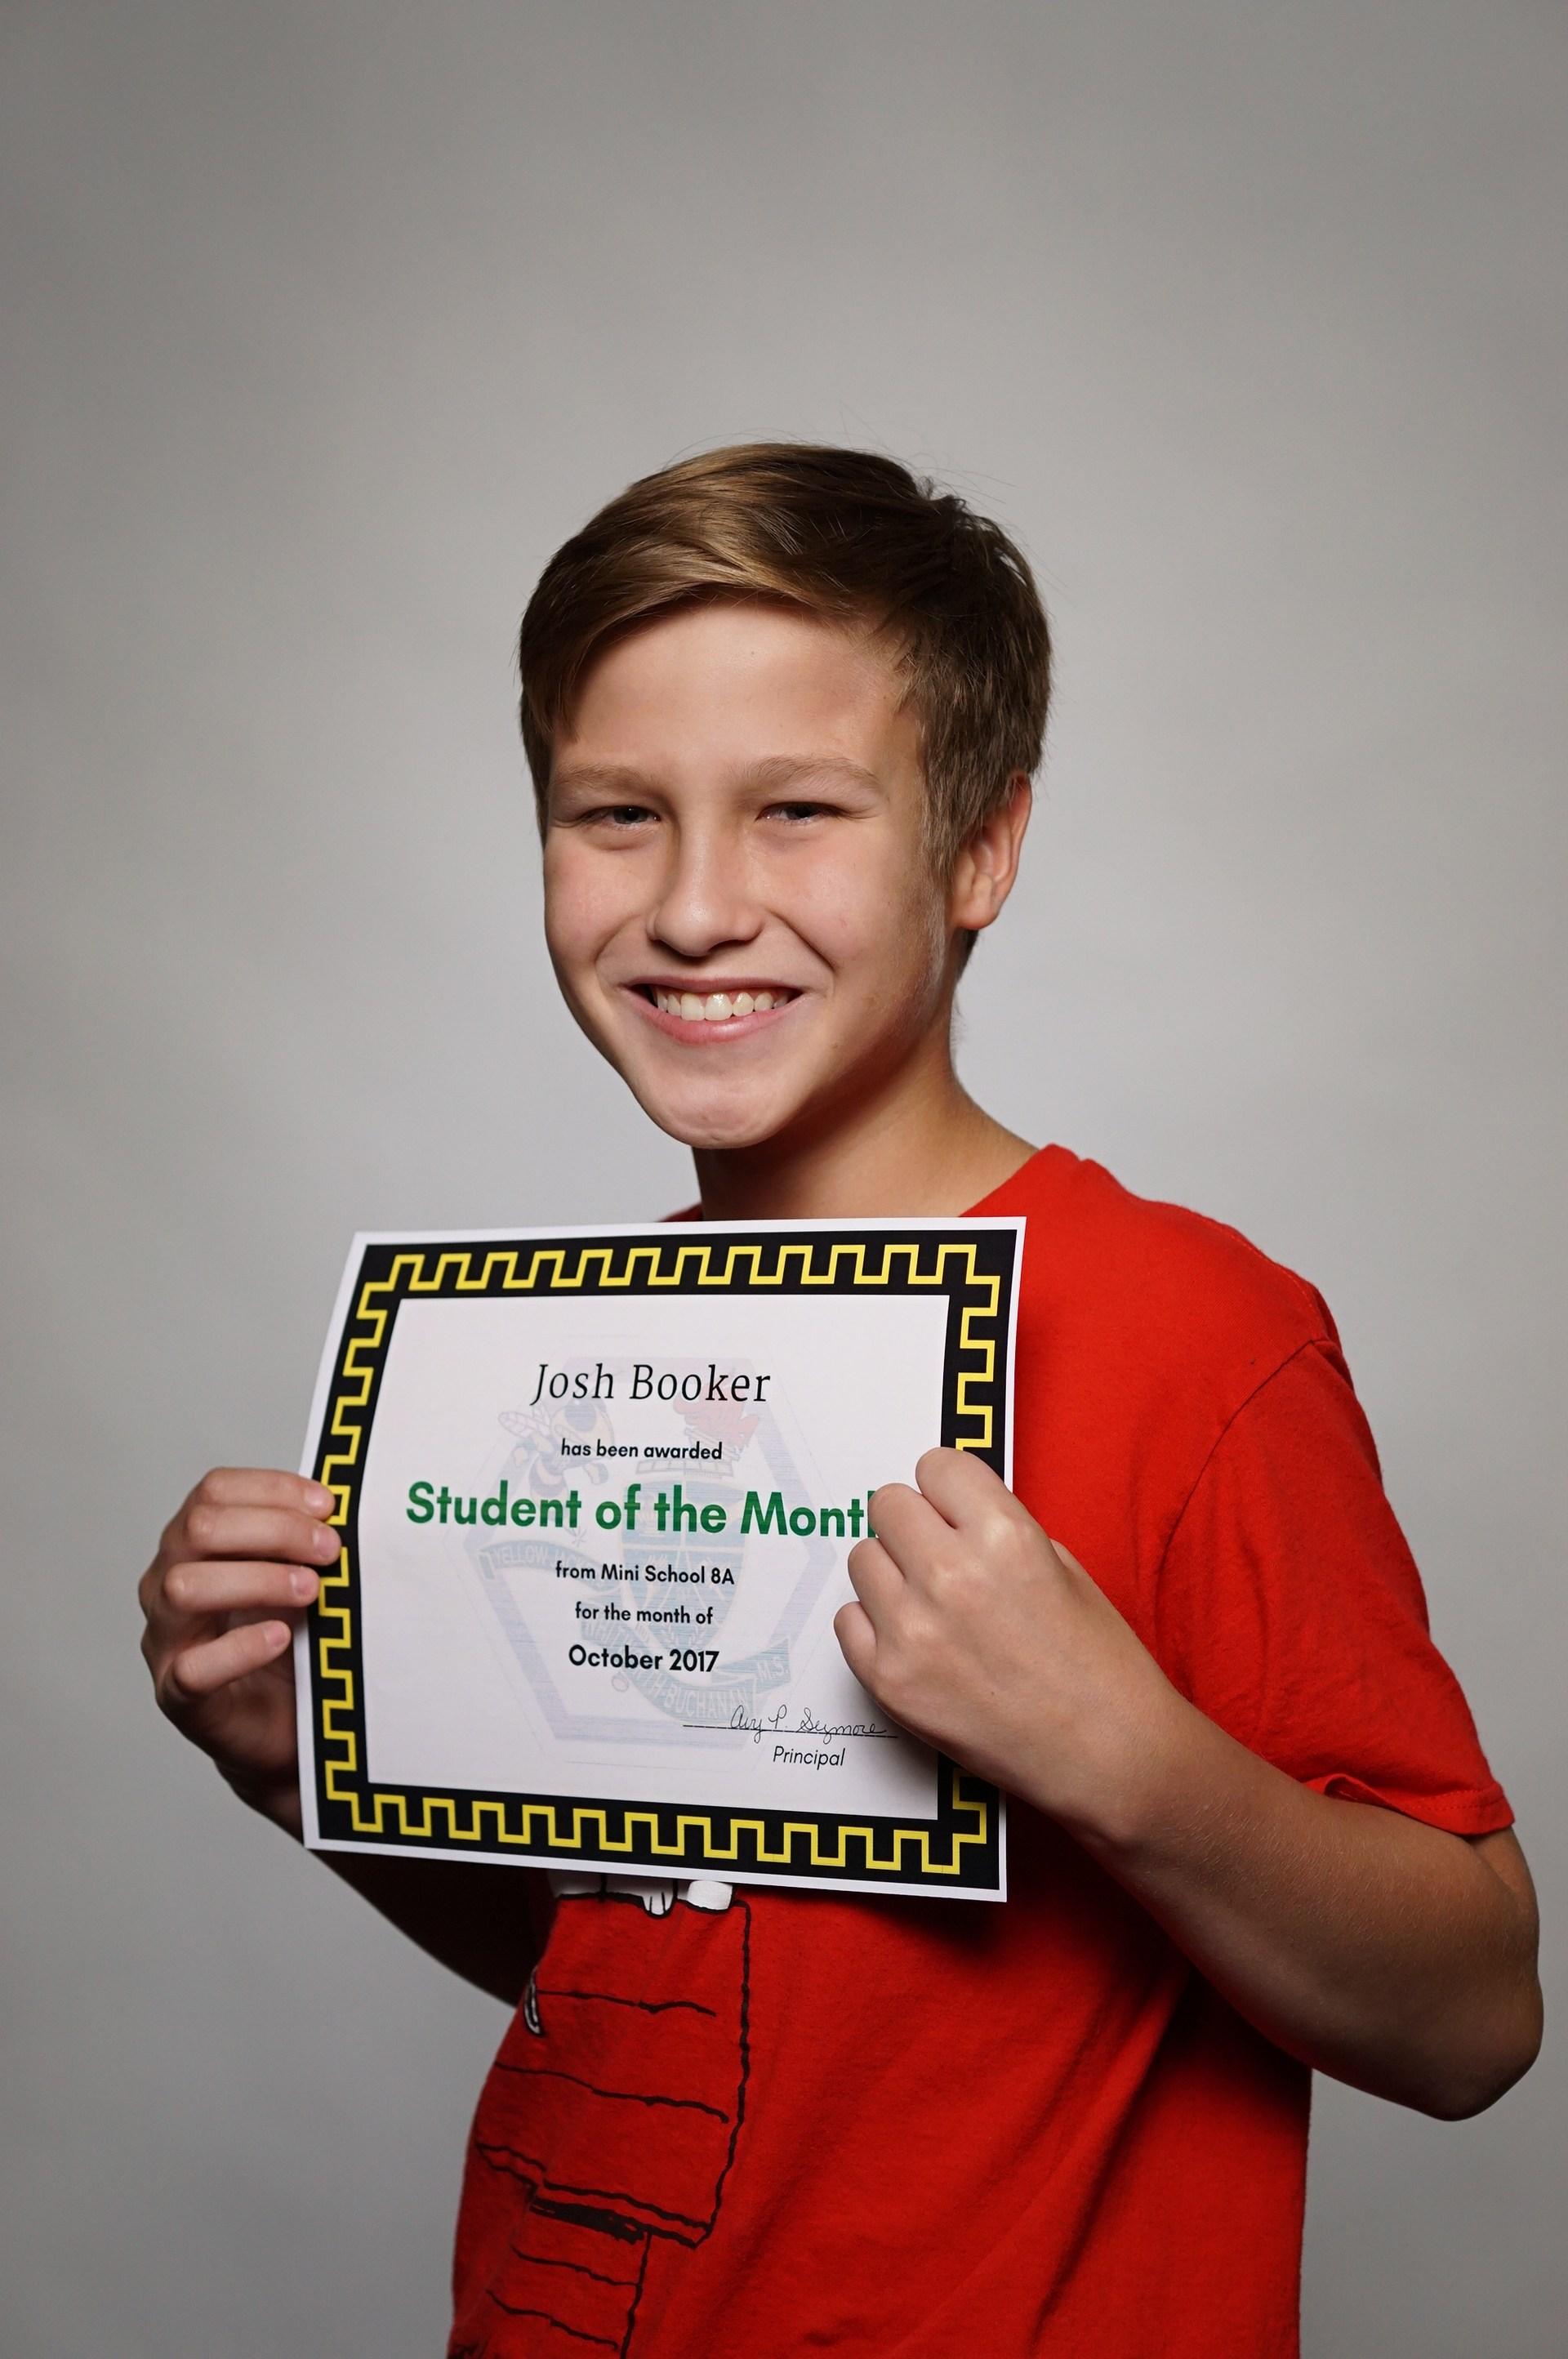 Josh Booker